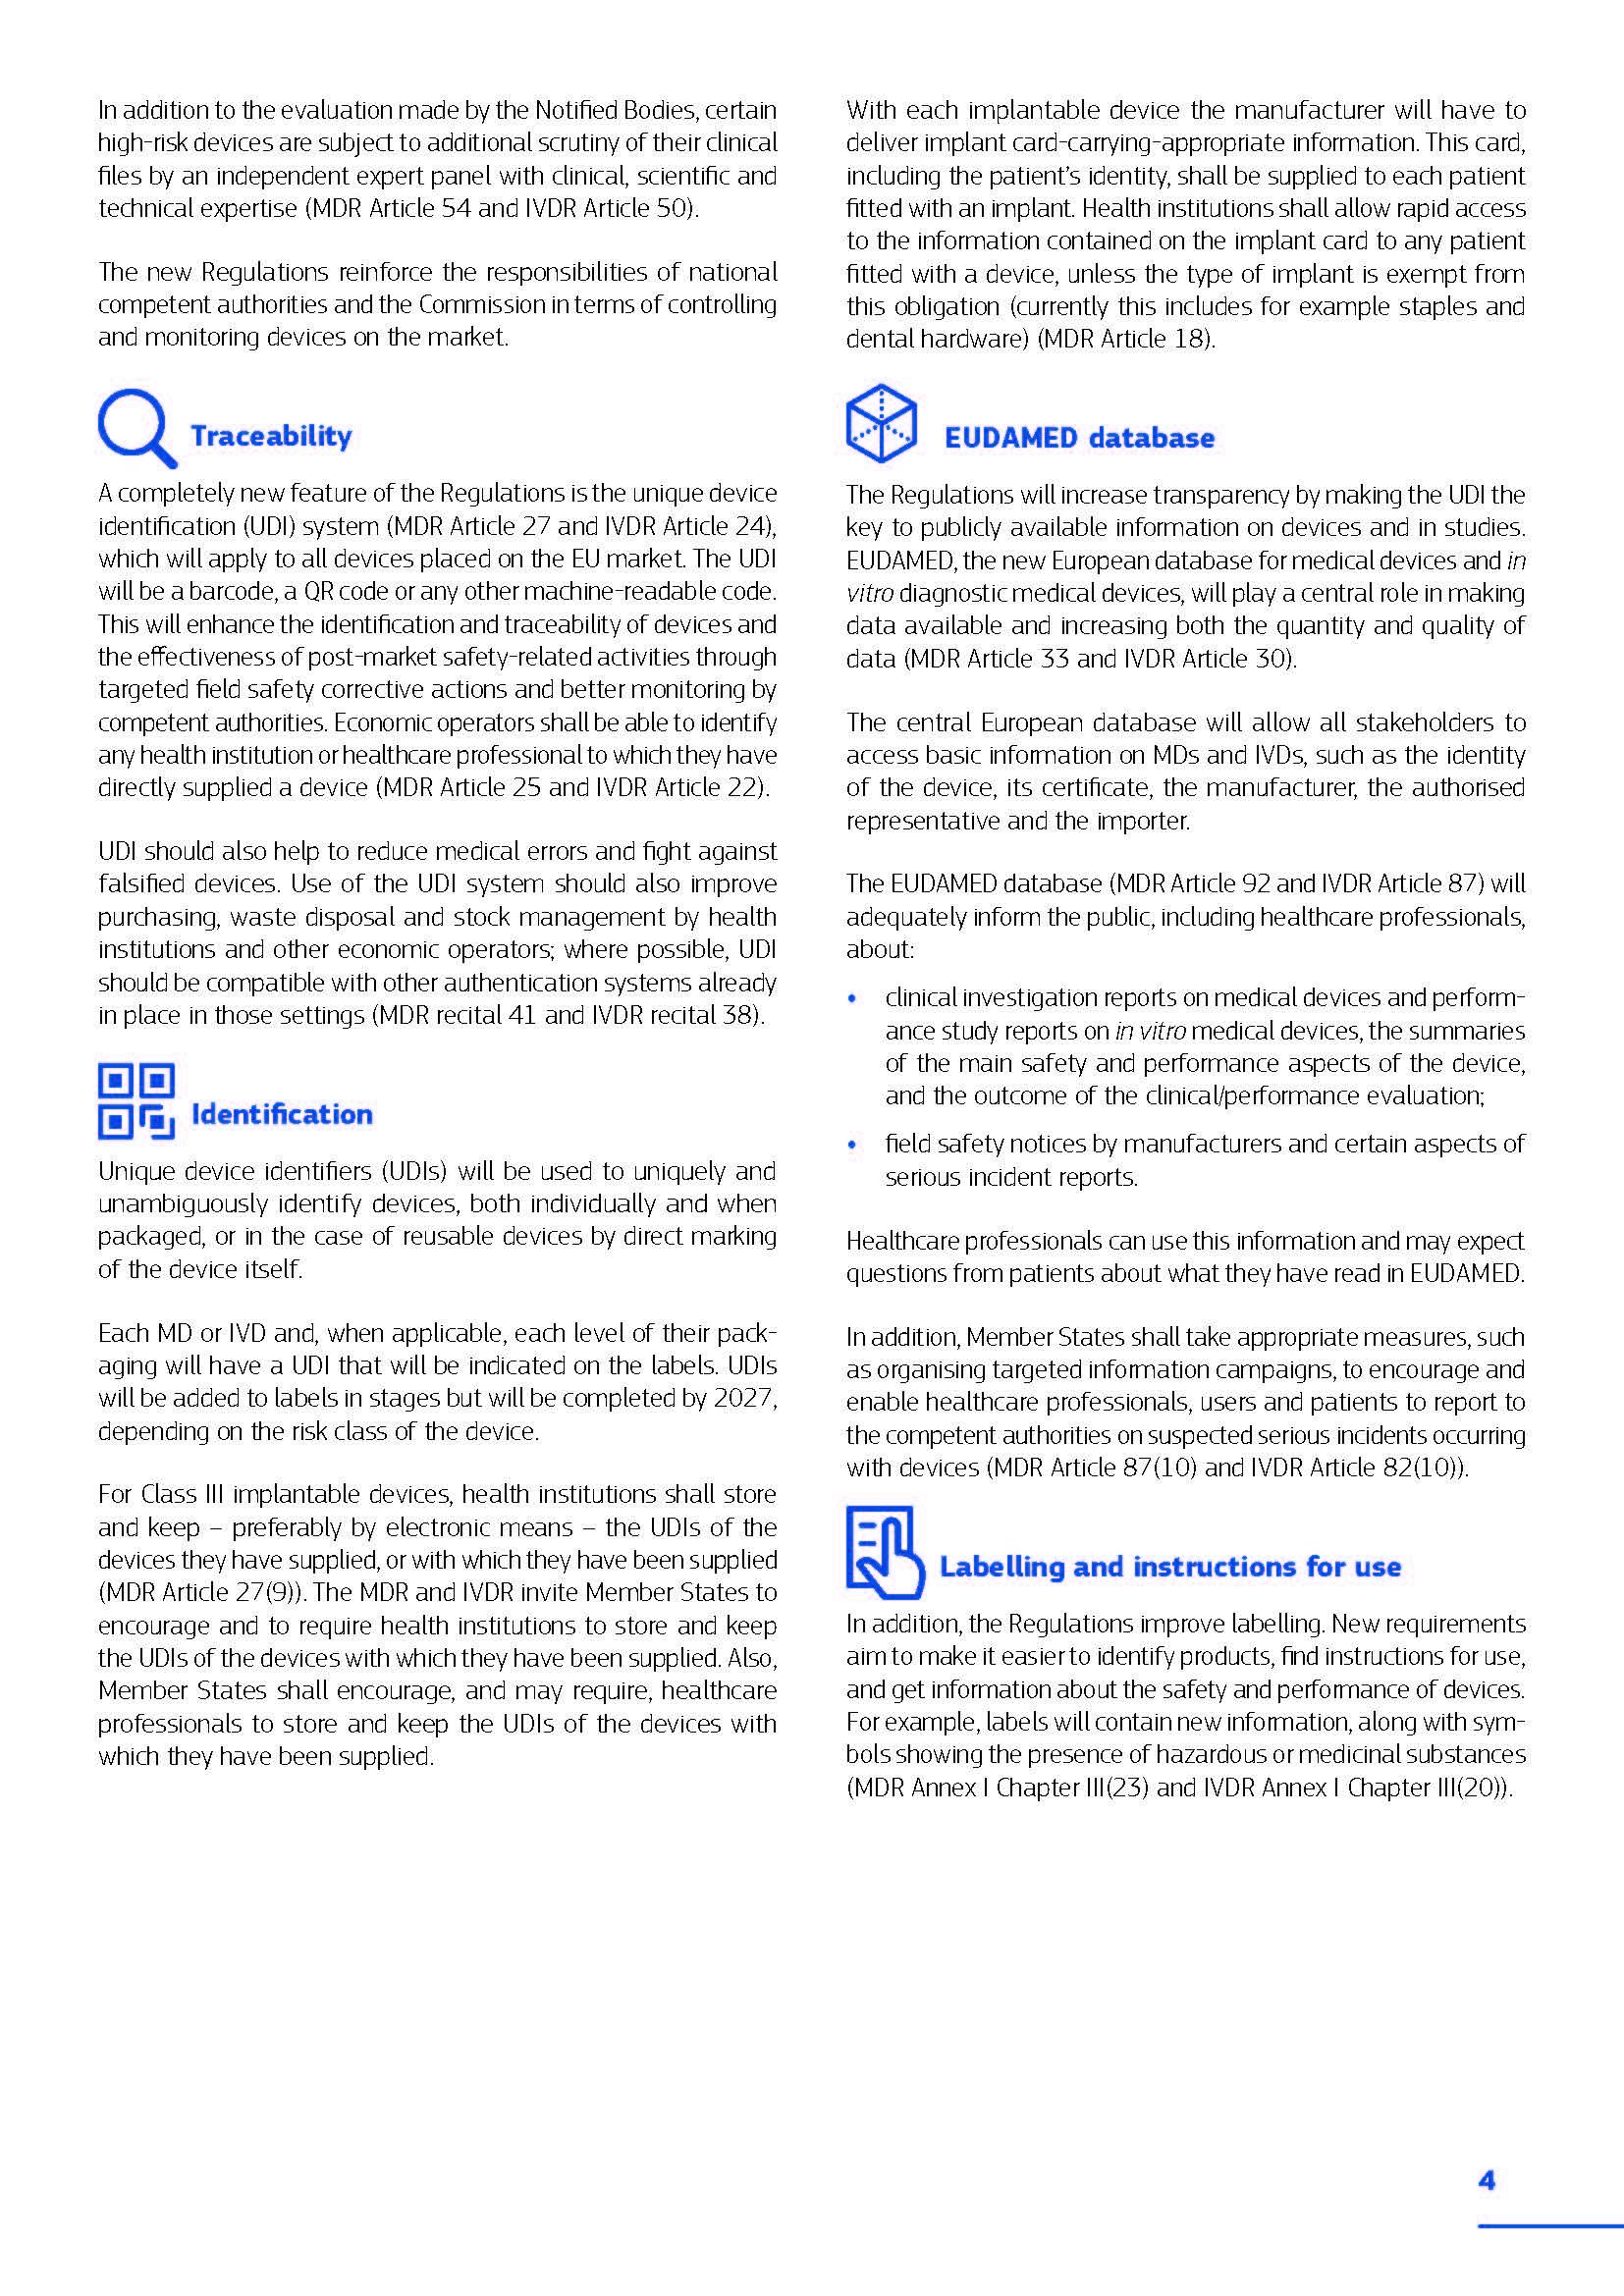 FS healthcare professionals_EN_Page_4.jpg